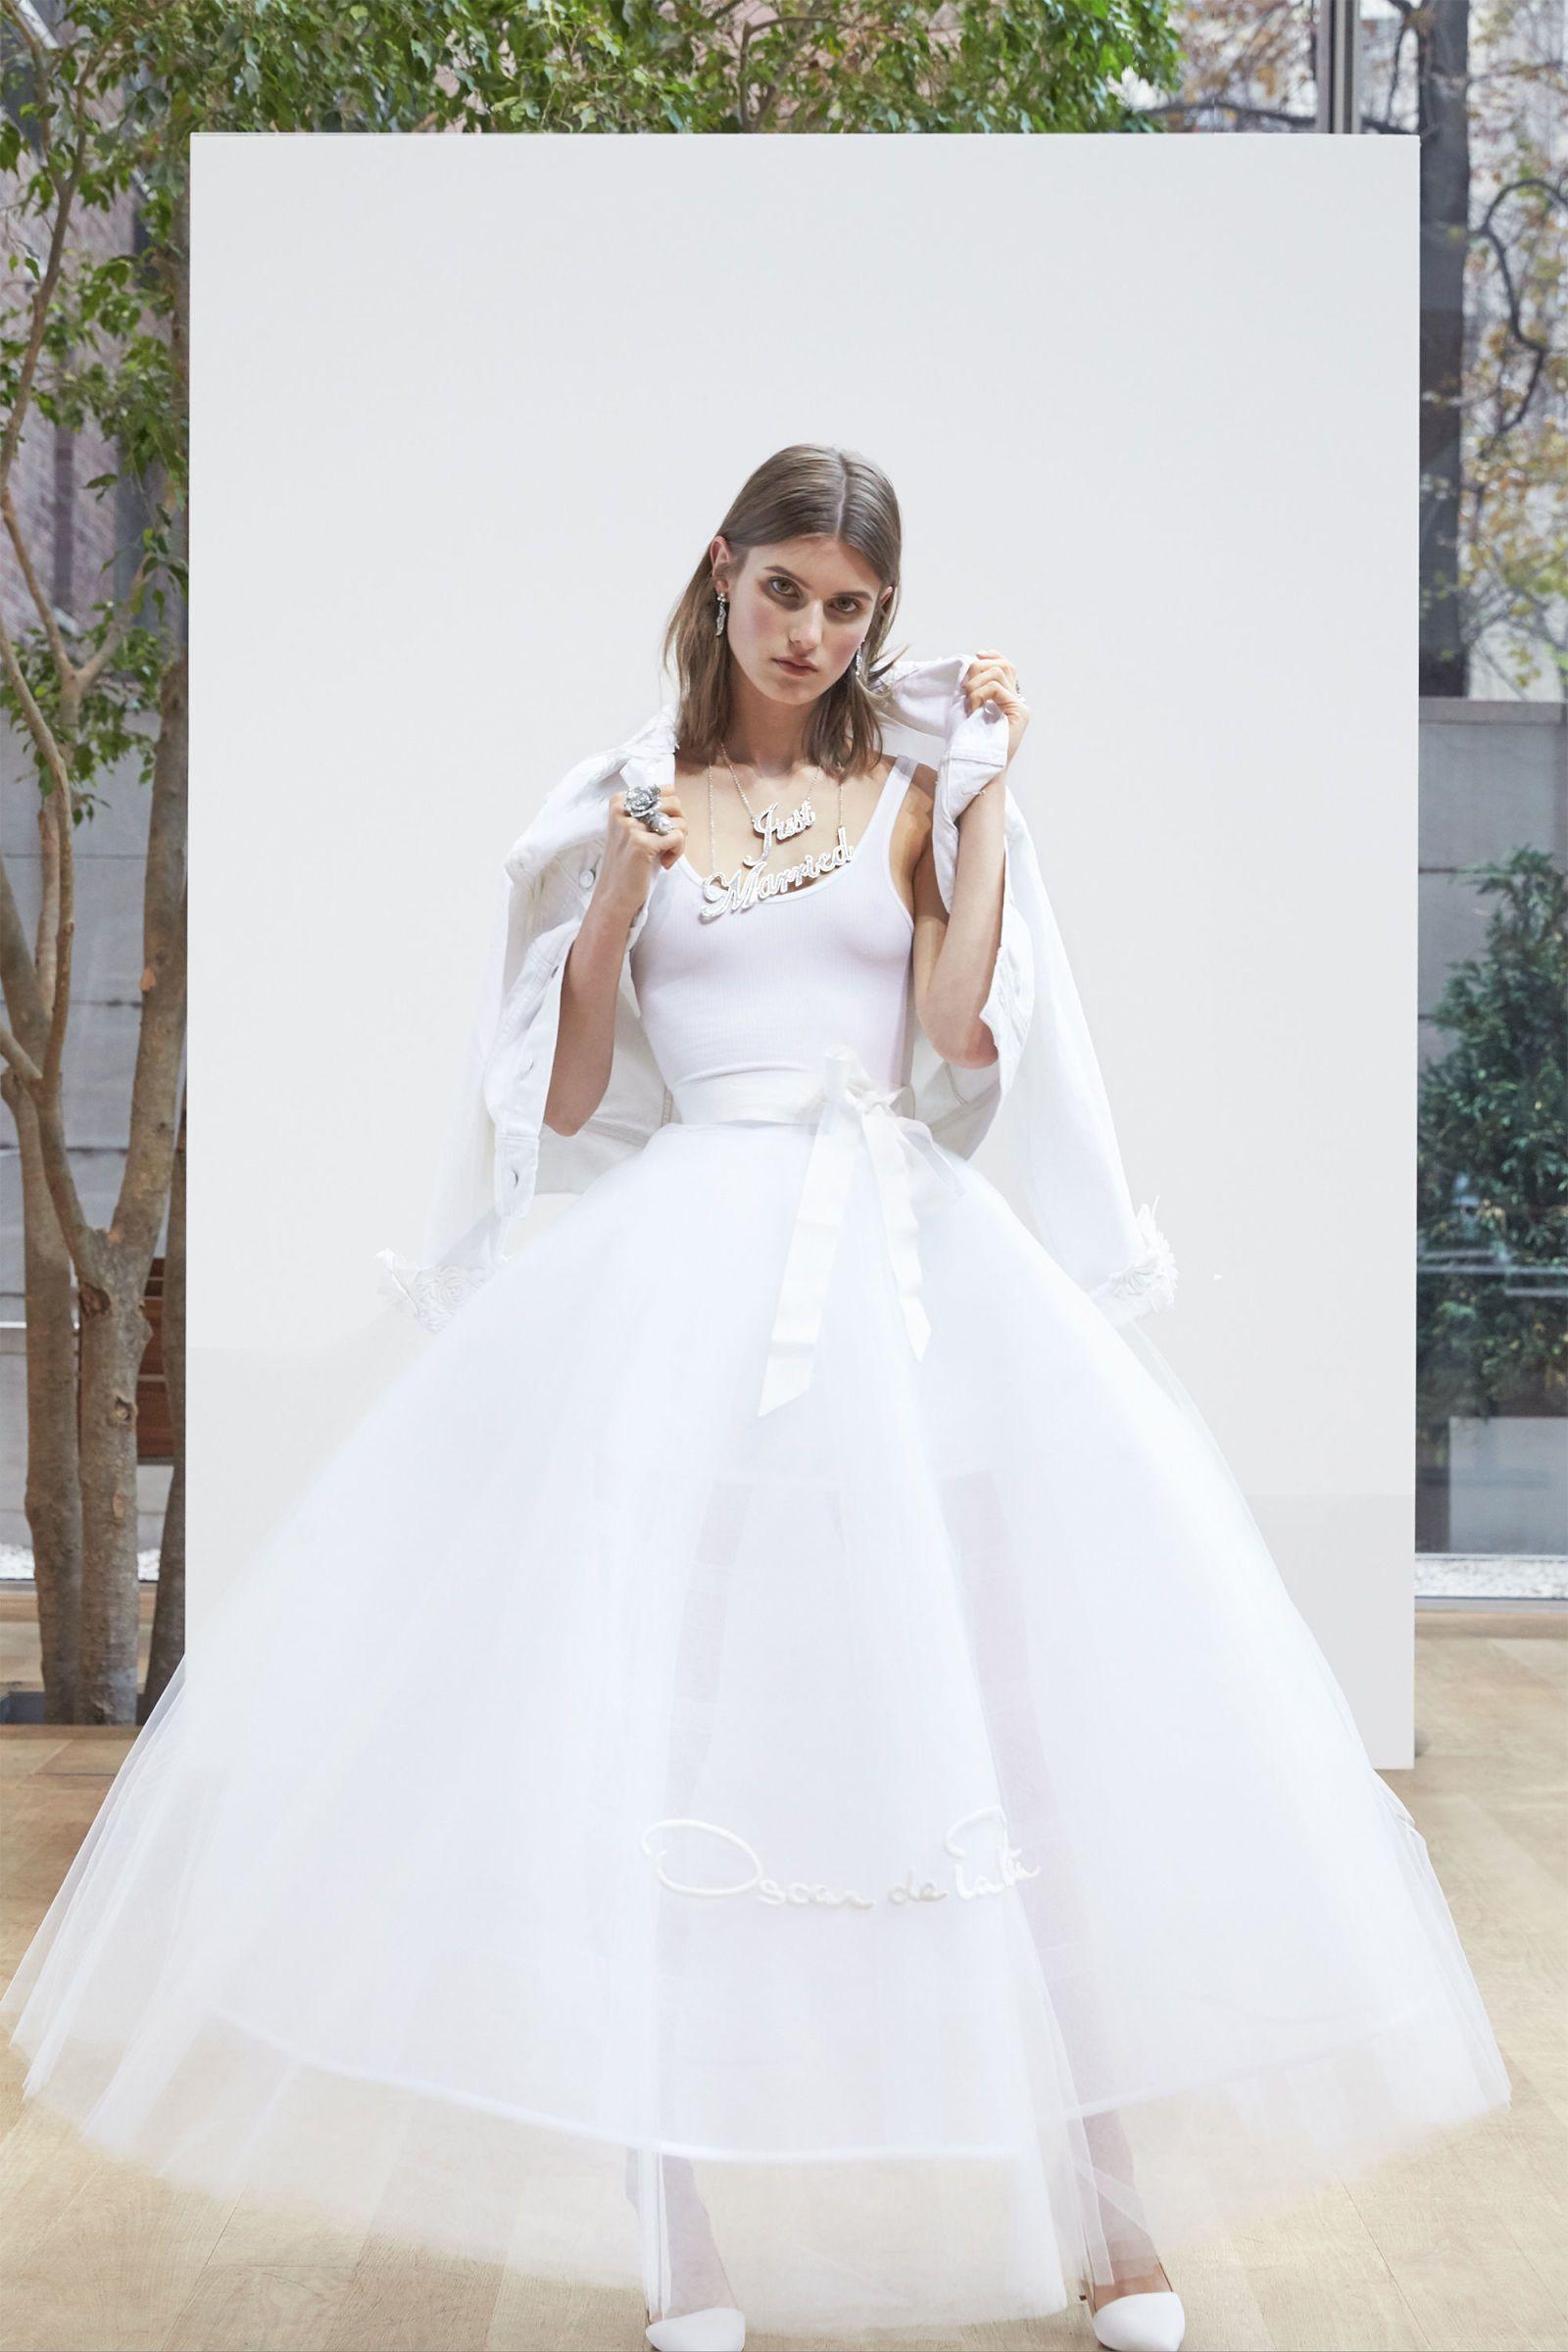 50 Short Wedding Dresses - Tea Length and Knee Length White Wedding ...